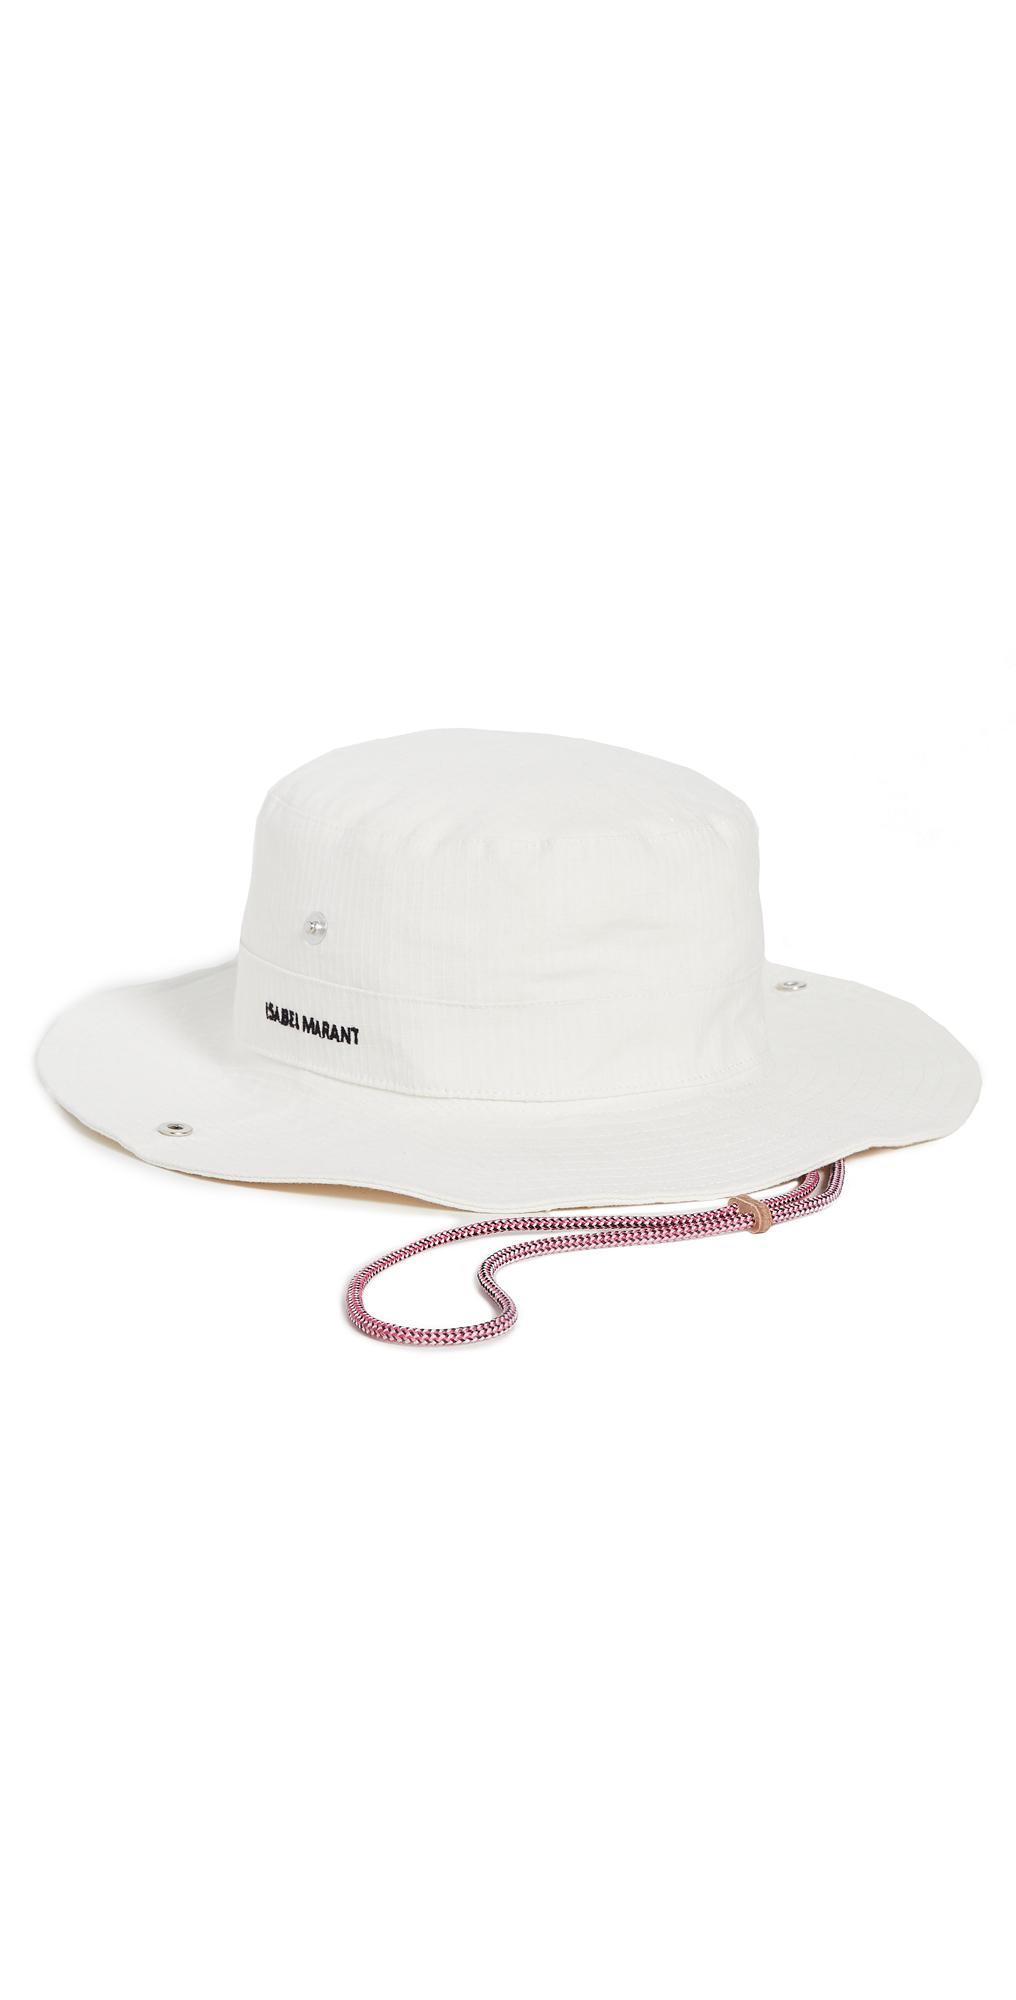 Isabel Marant Caviano Bucket Hat